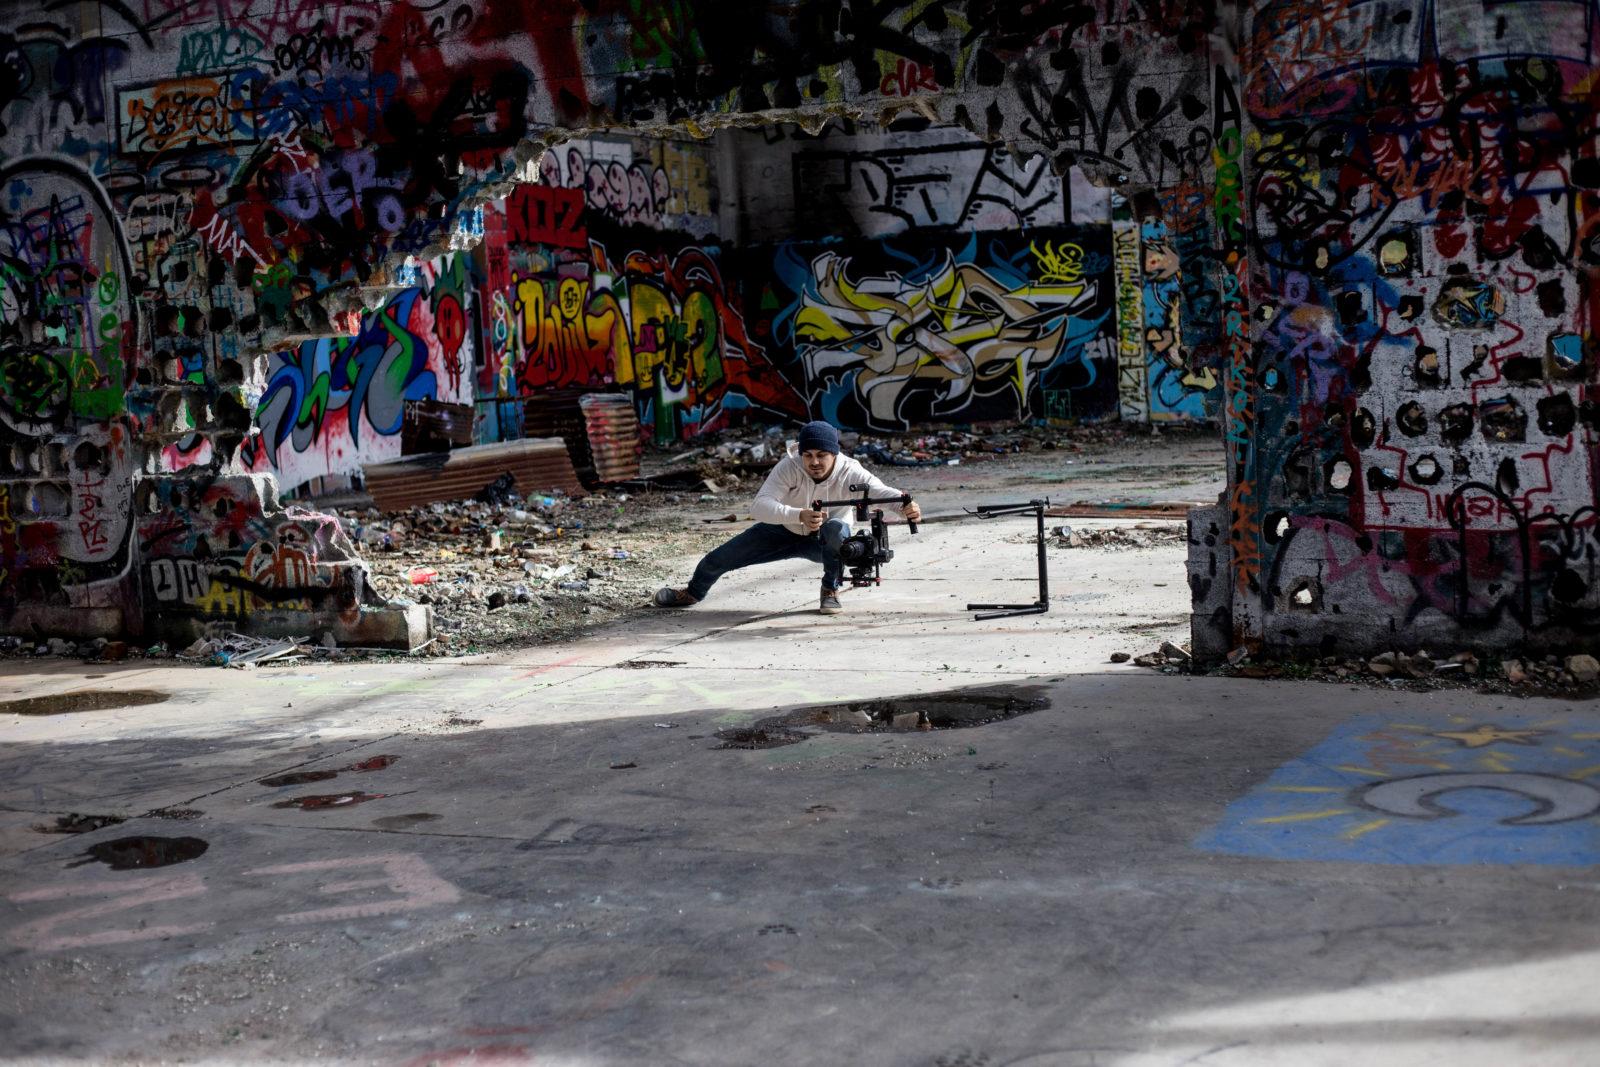 urbex jeanpantaleo skate Marseille LaCaverne tags graffitiIMG7249 - Des tricks et du freestyle avec Jean Pantaleo dans un skatepark 100% DIY